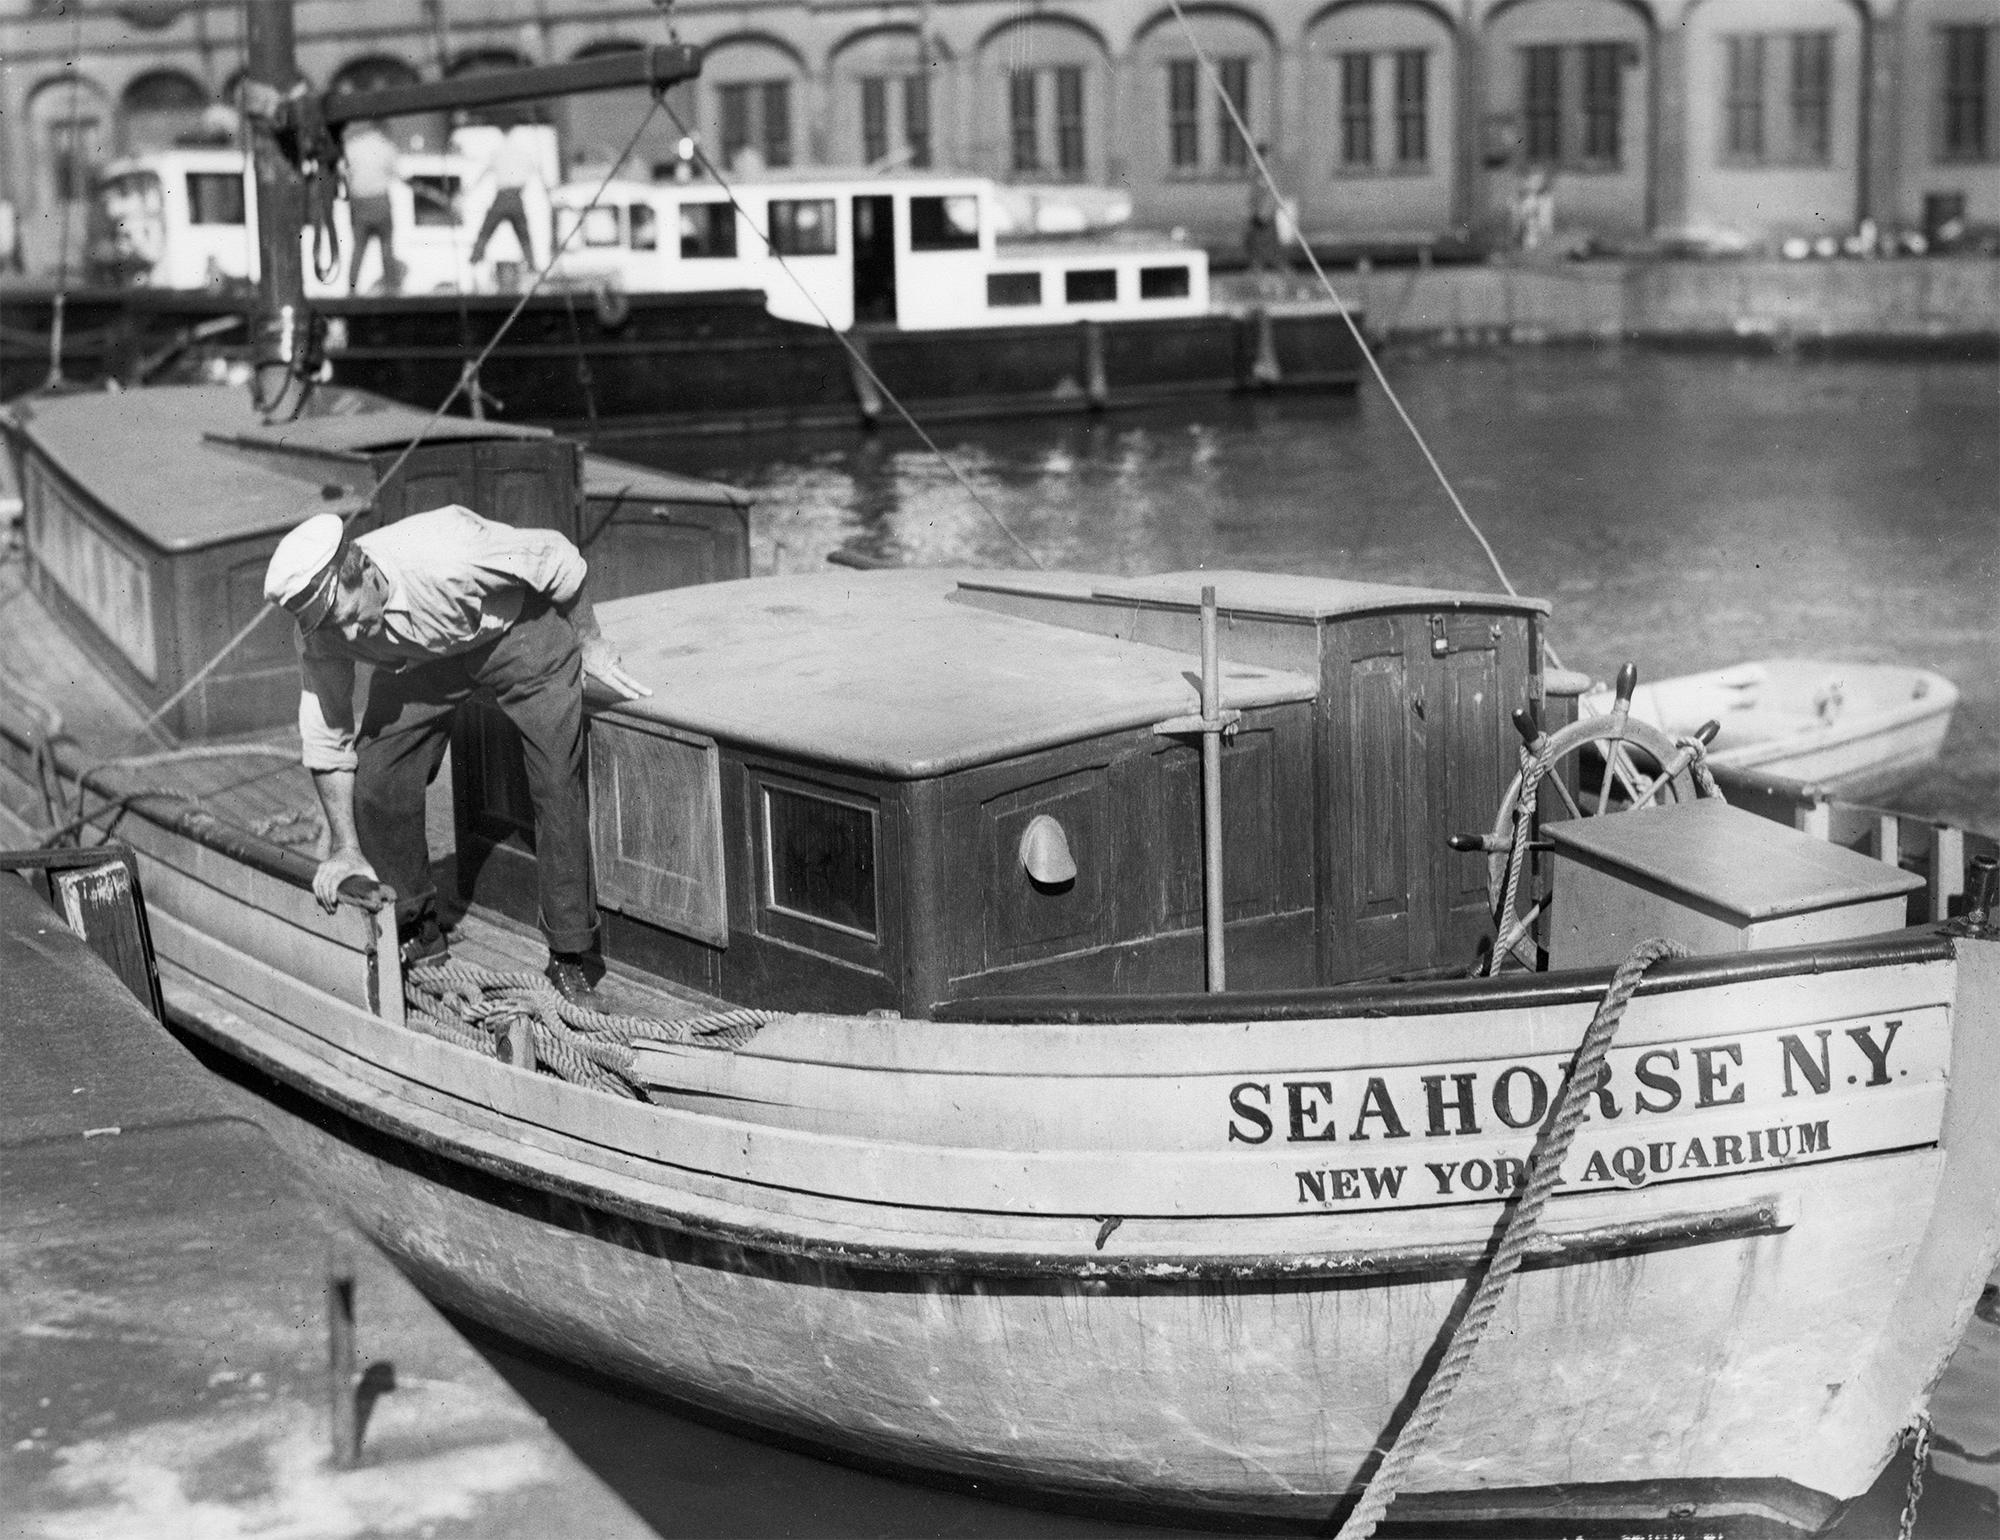 Ahoy, SS Seahorse